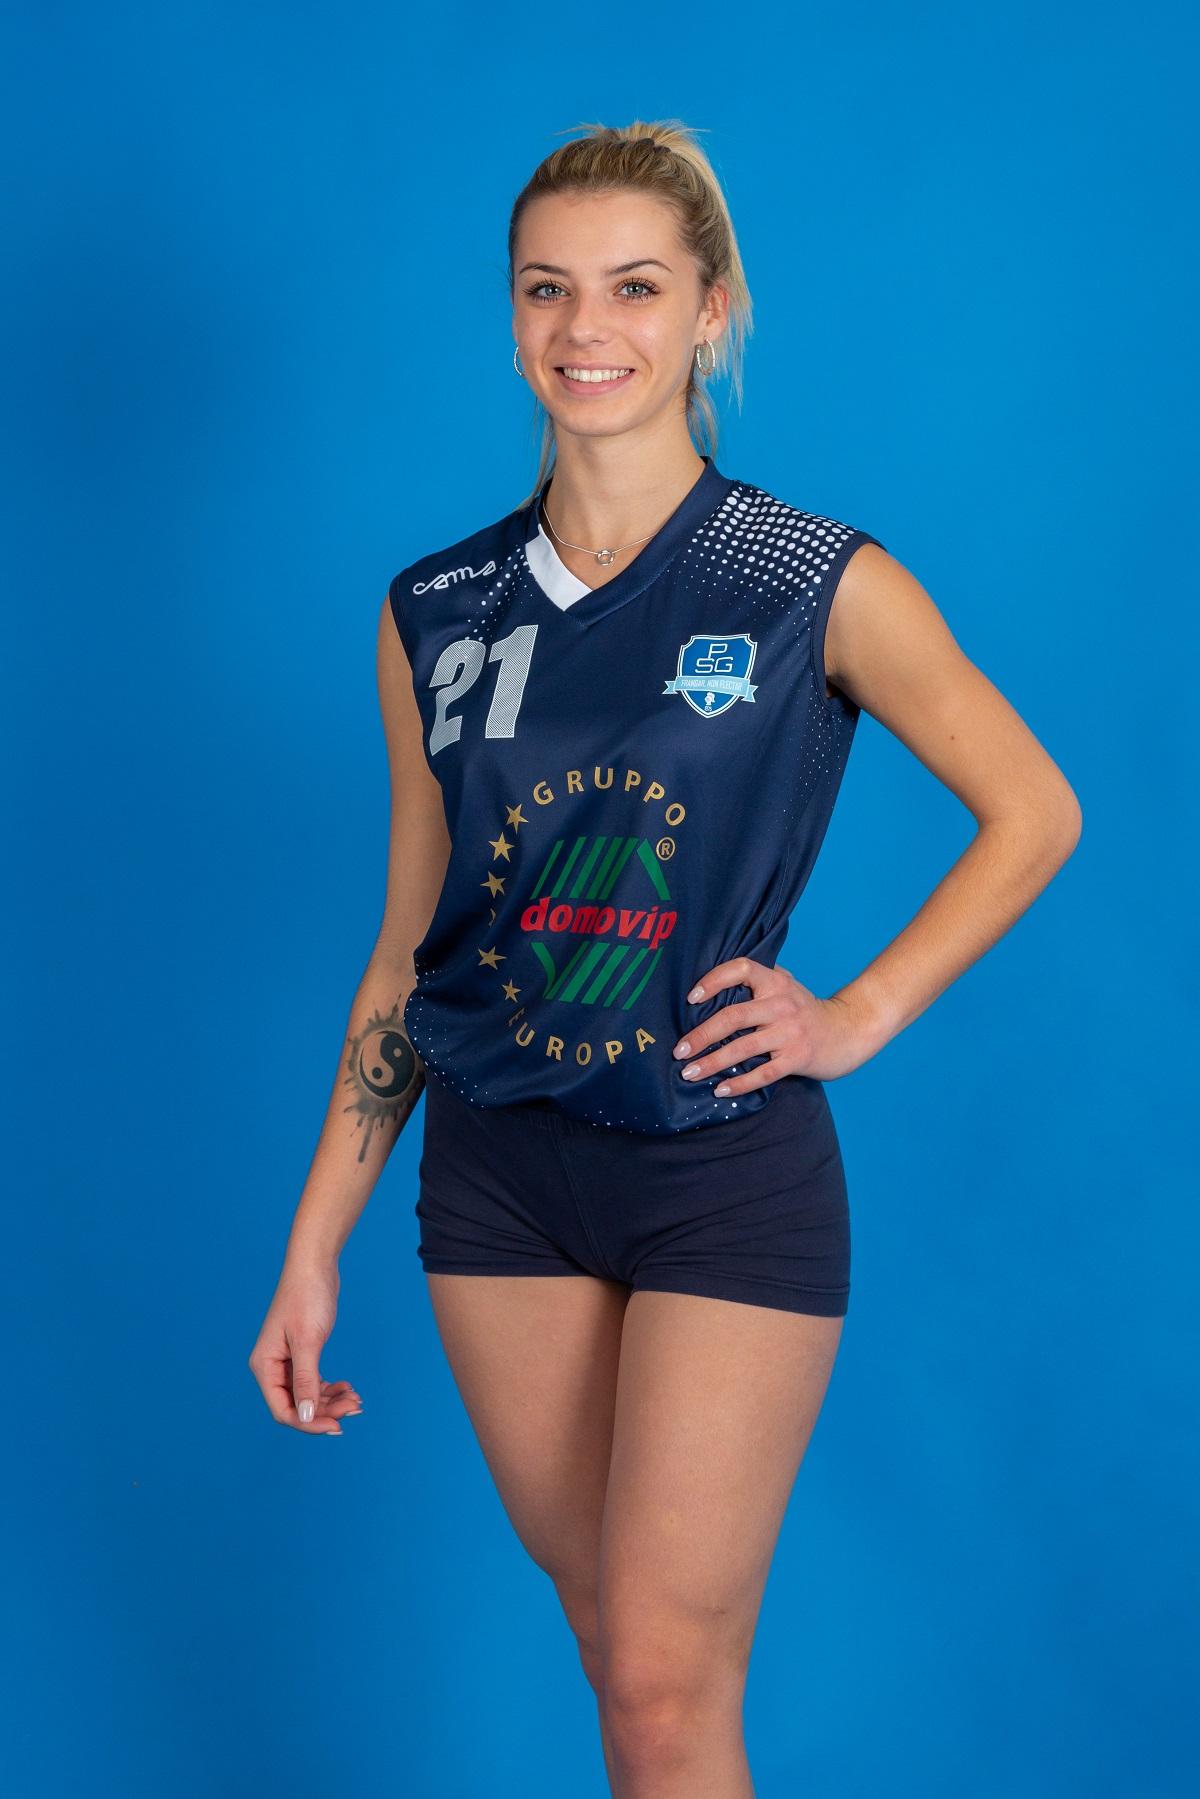 Jenny De Vecchi